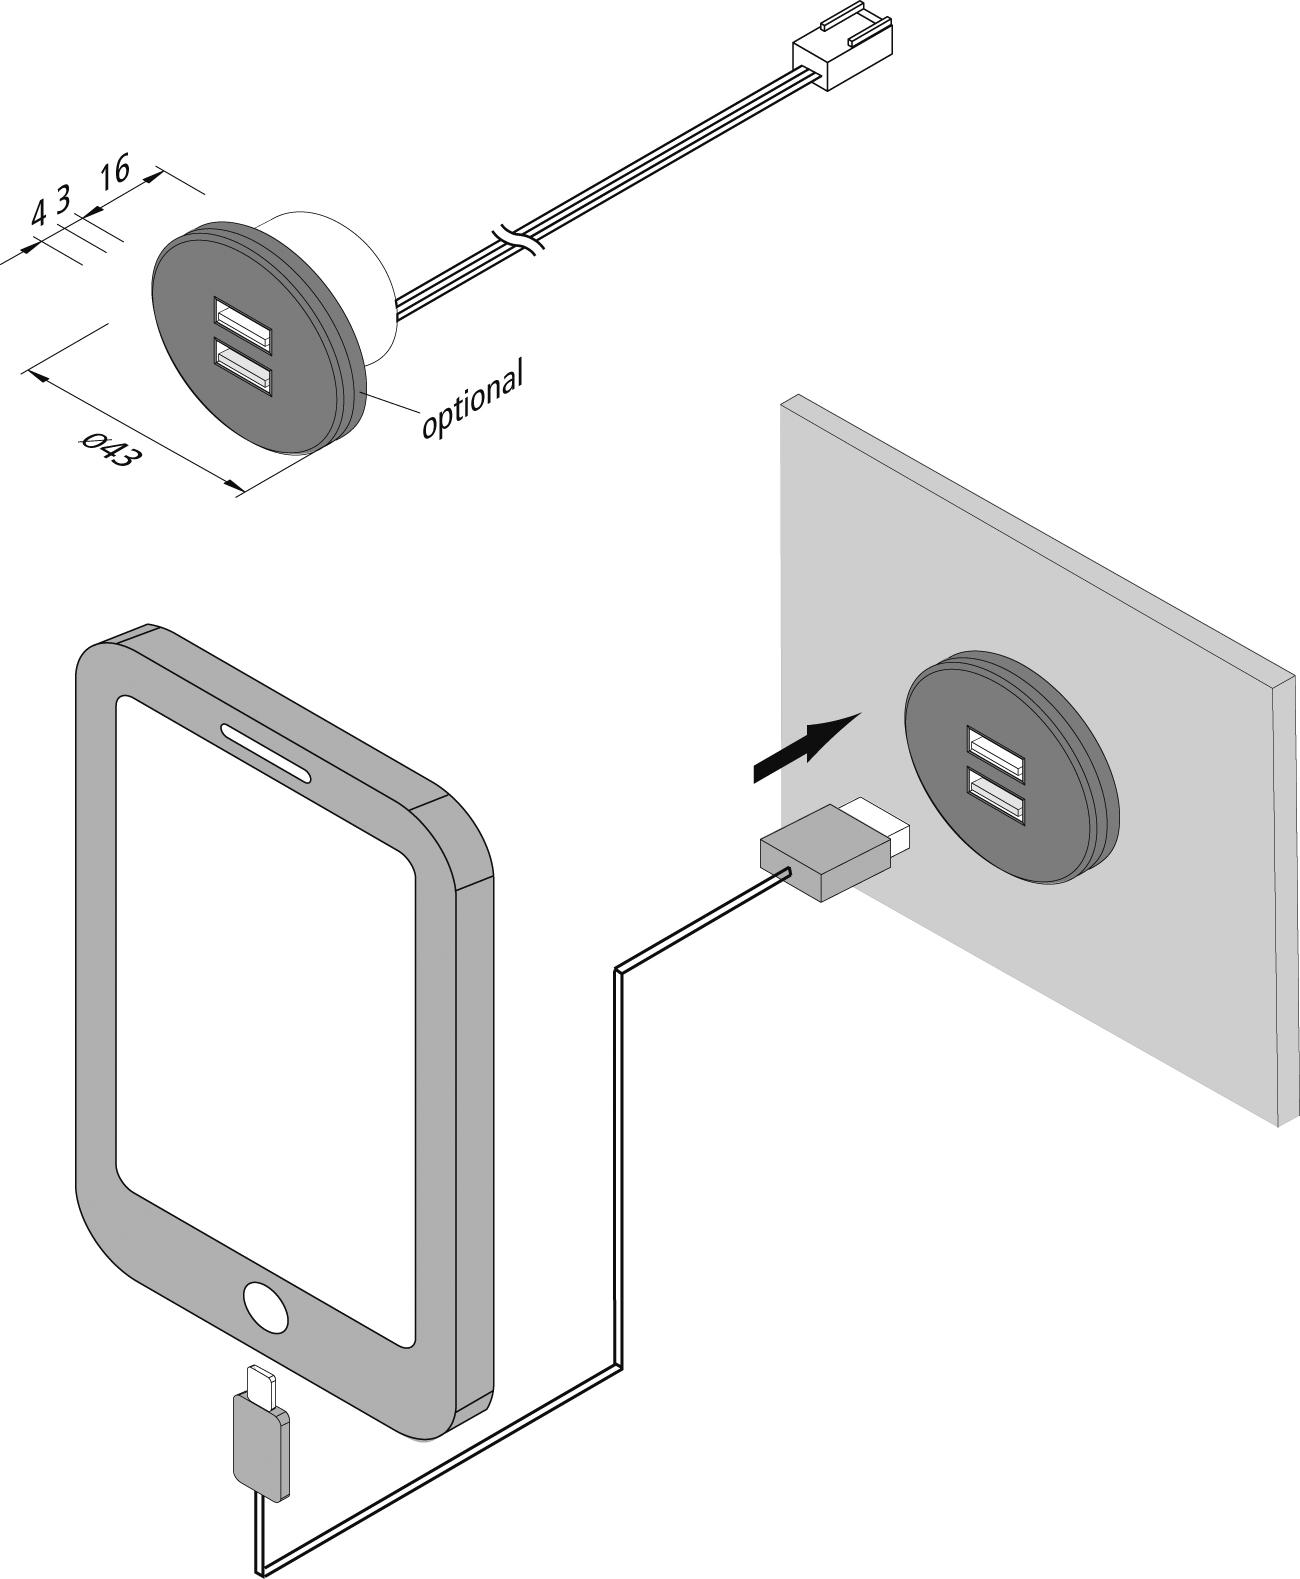 Preview: USB-Doppelsteckdose_en